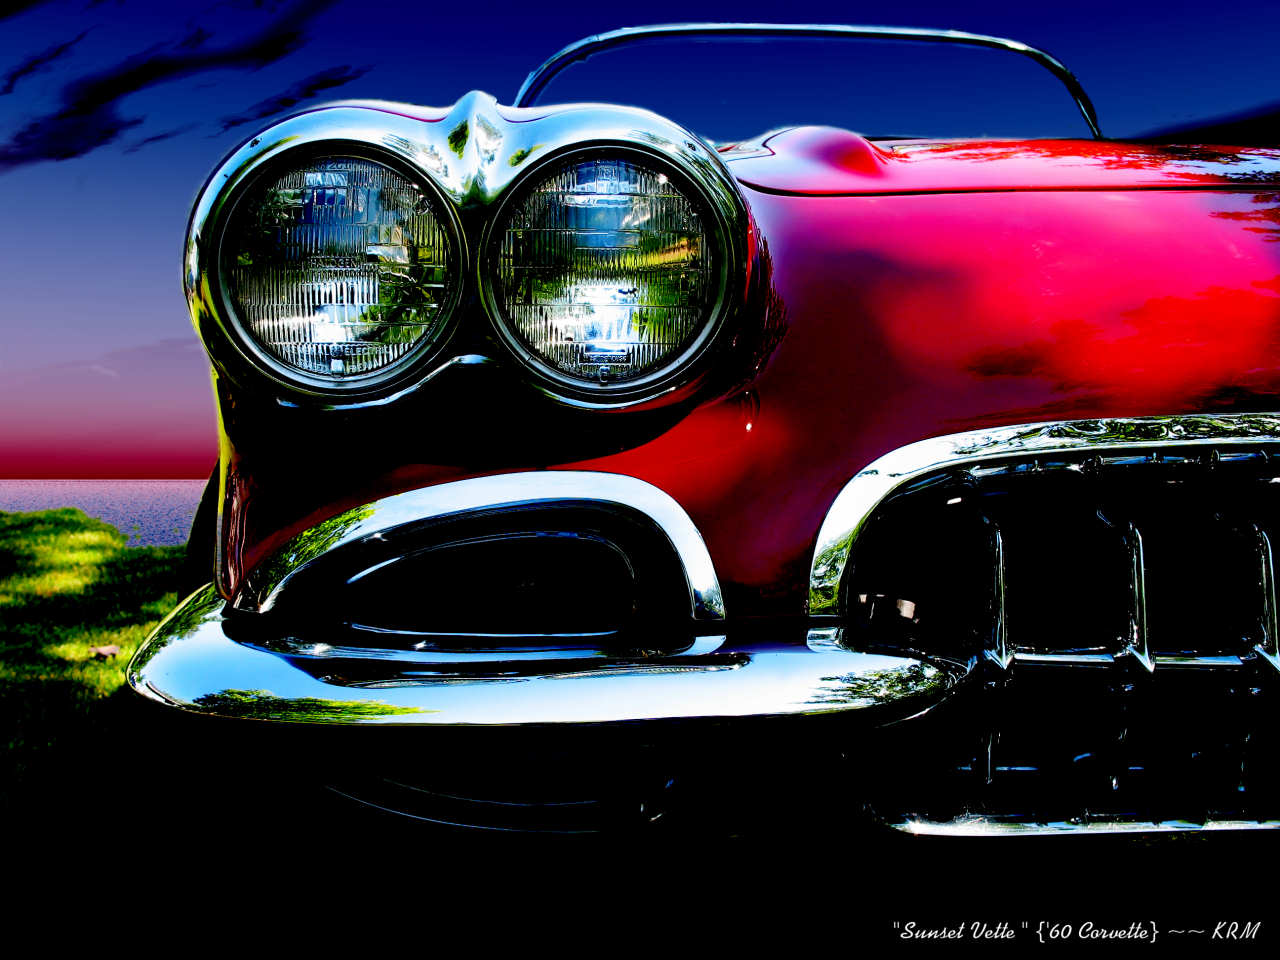 Click image for larger version  Name:KRM-CARS08-1960 Corvette=KRM.jpg Views:208 Size:153.8 KB ID:21533